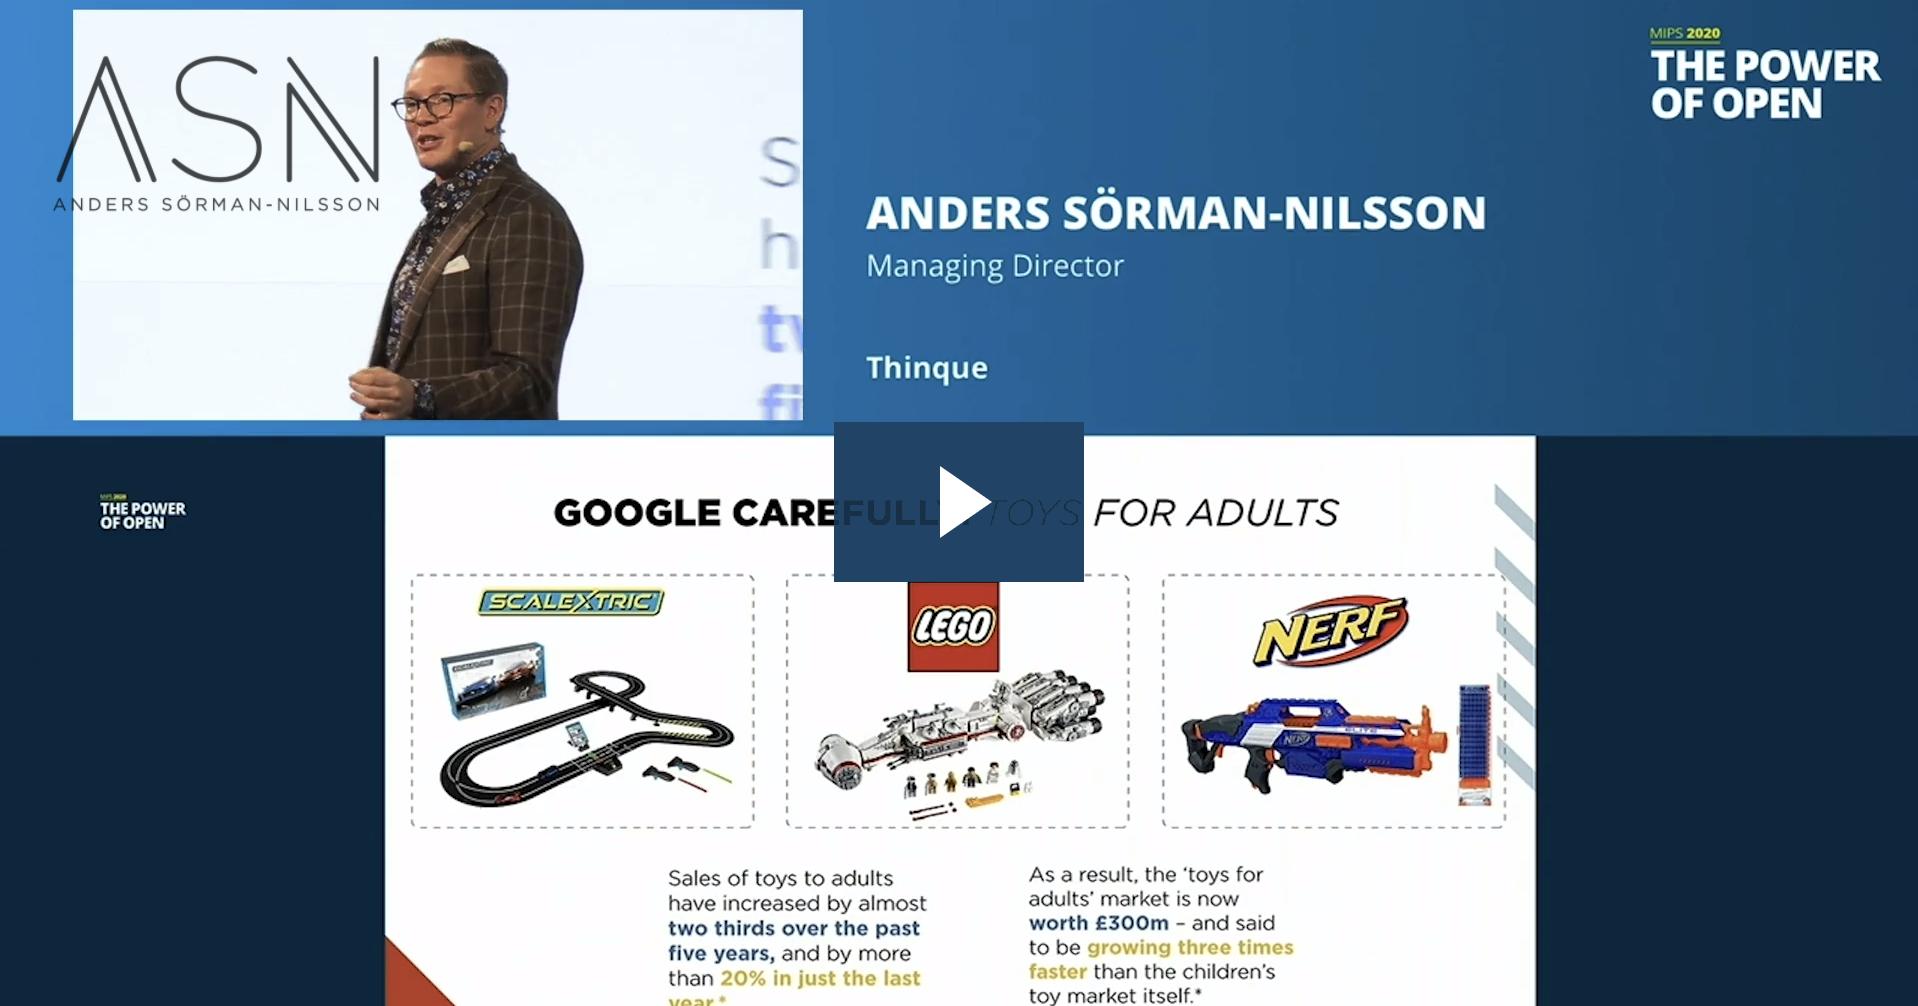 Lego Futurist Keynote Speaker Anders Sorman-Nilsson